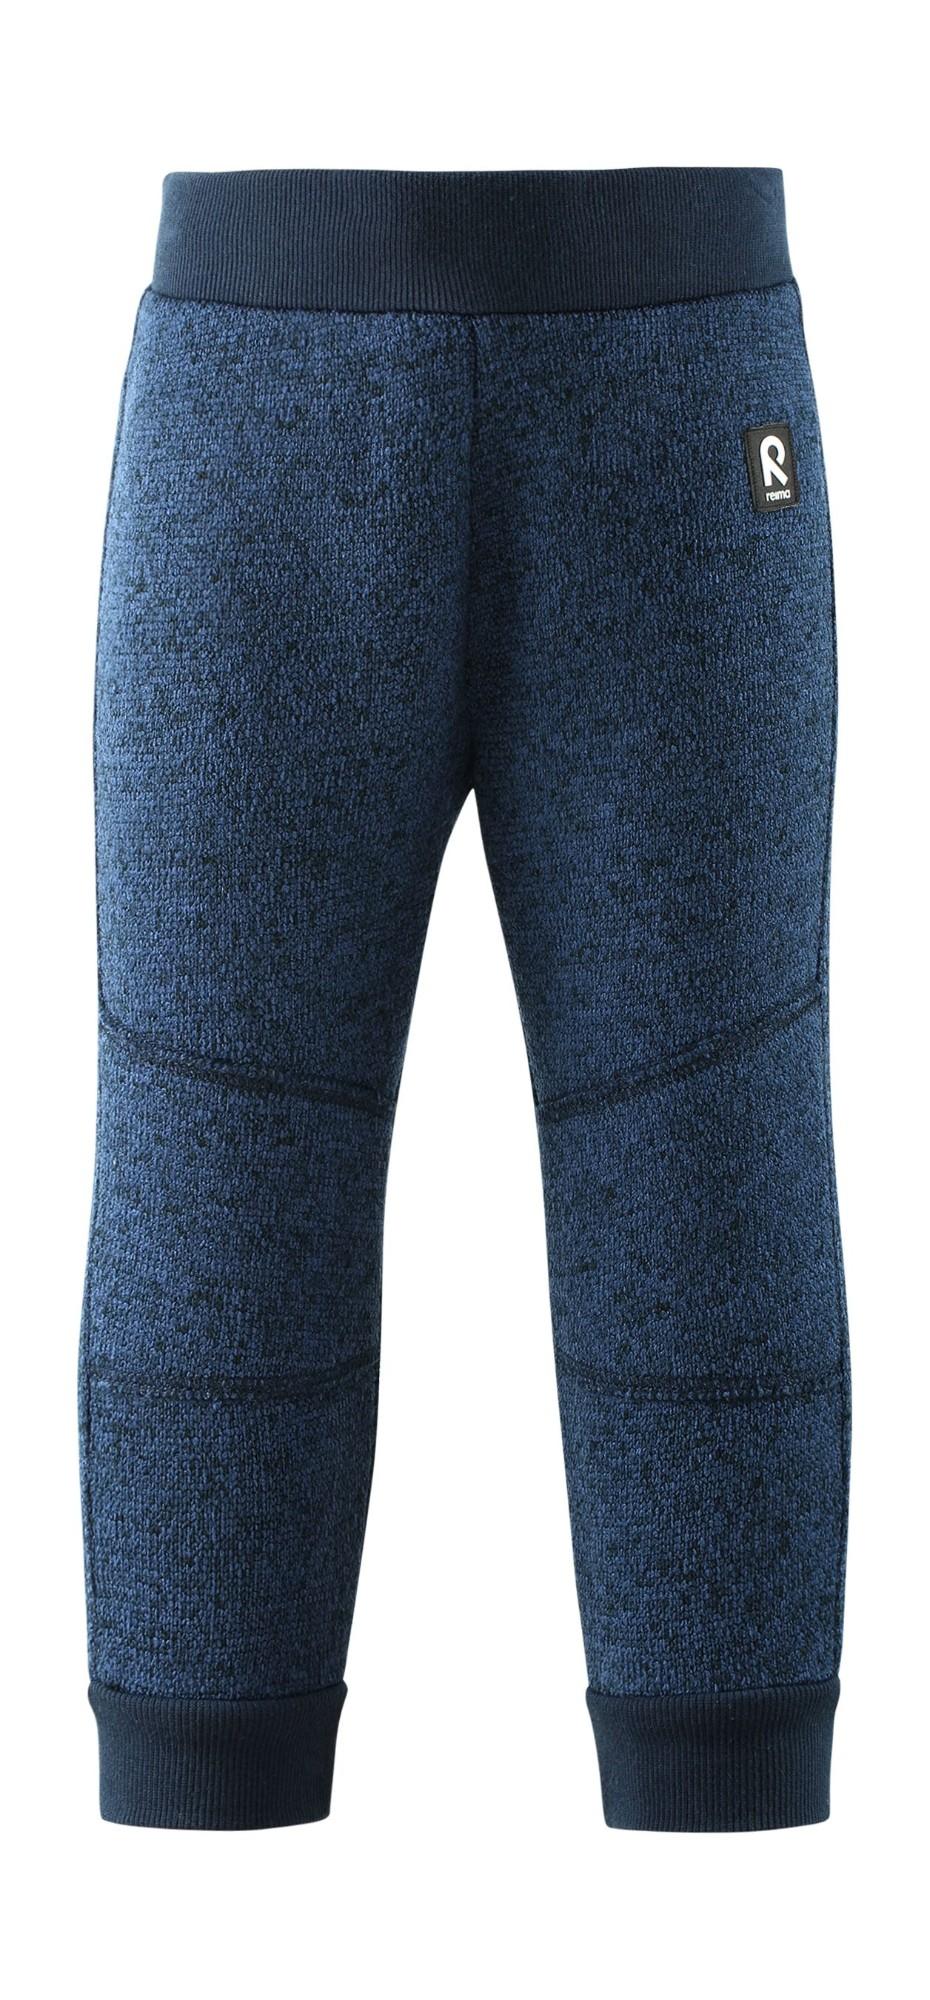 REIMA Vuotos Jeans Blue 98